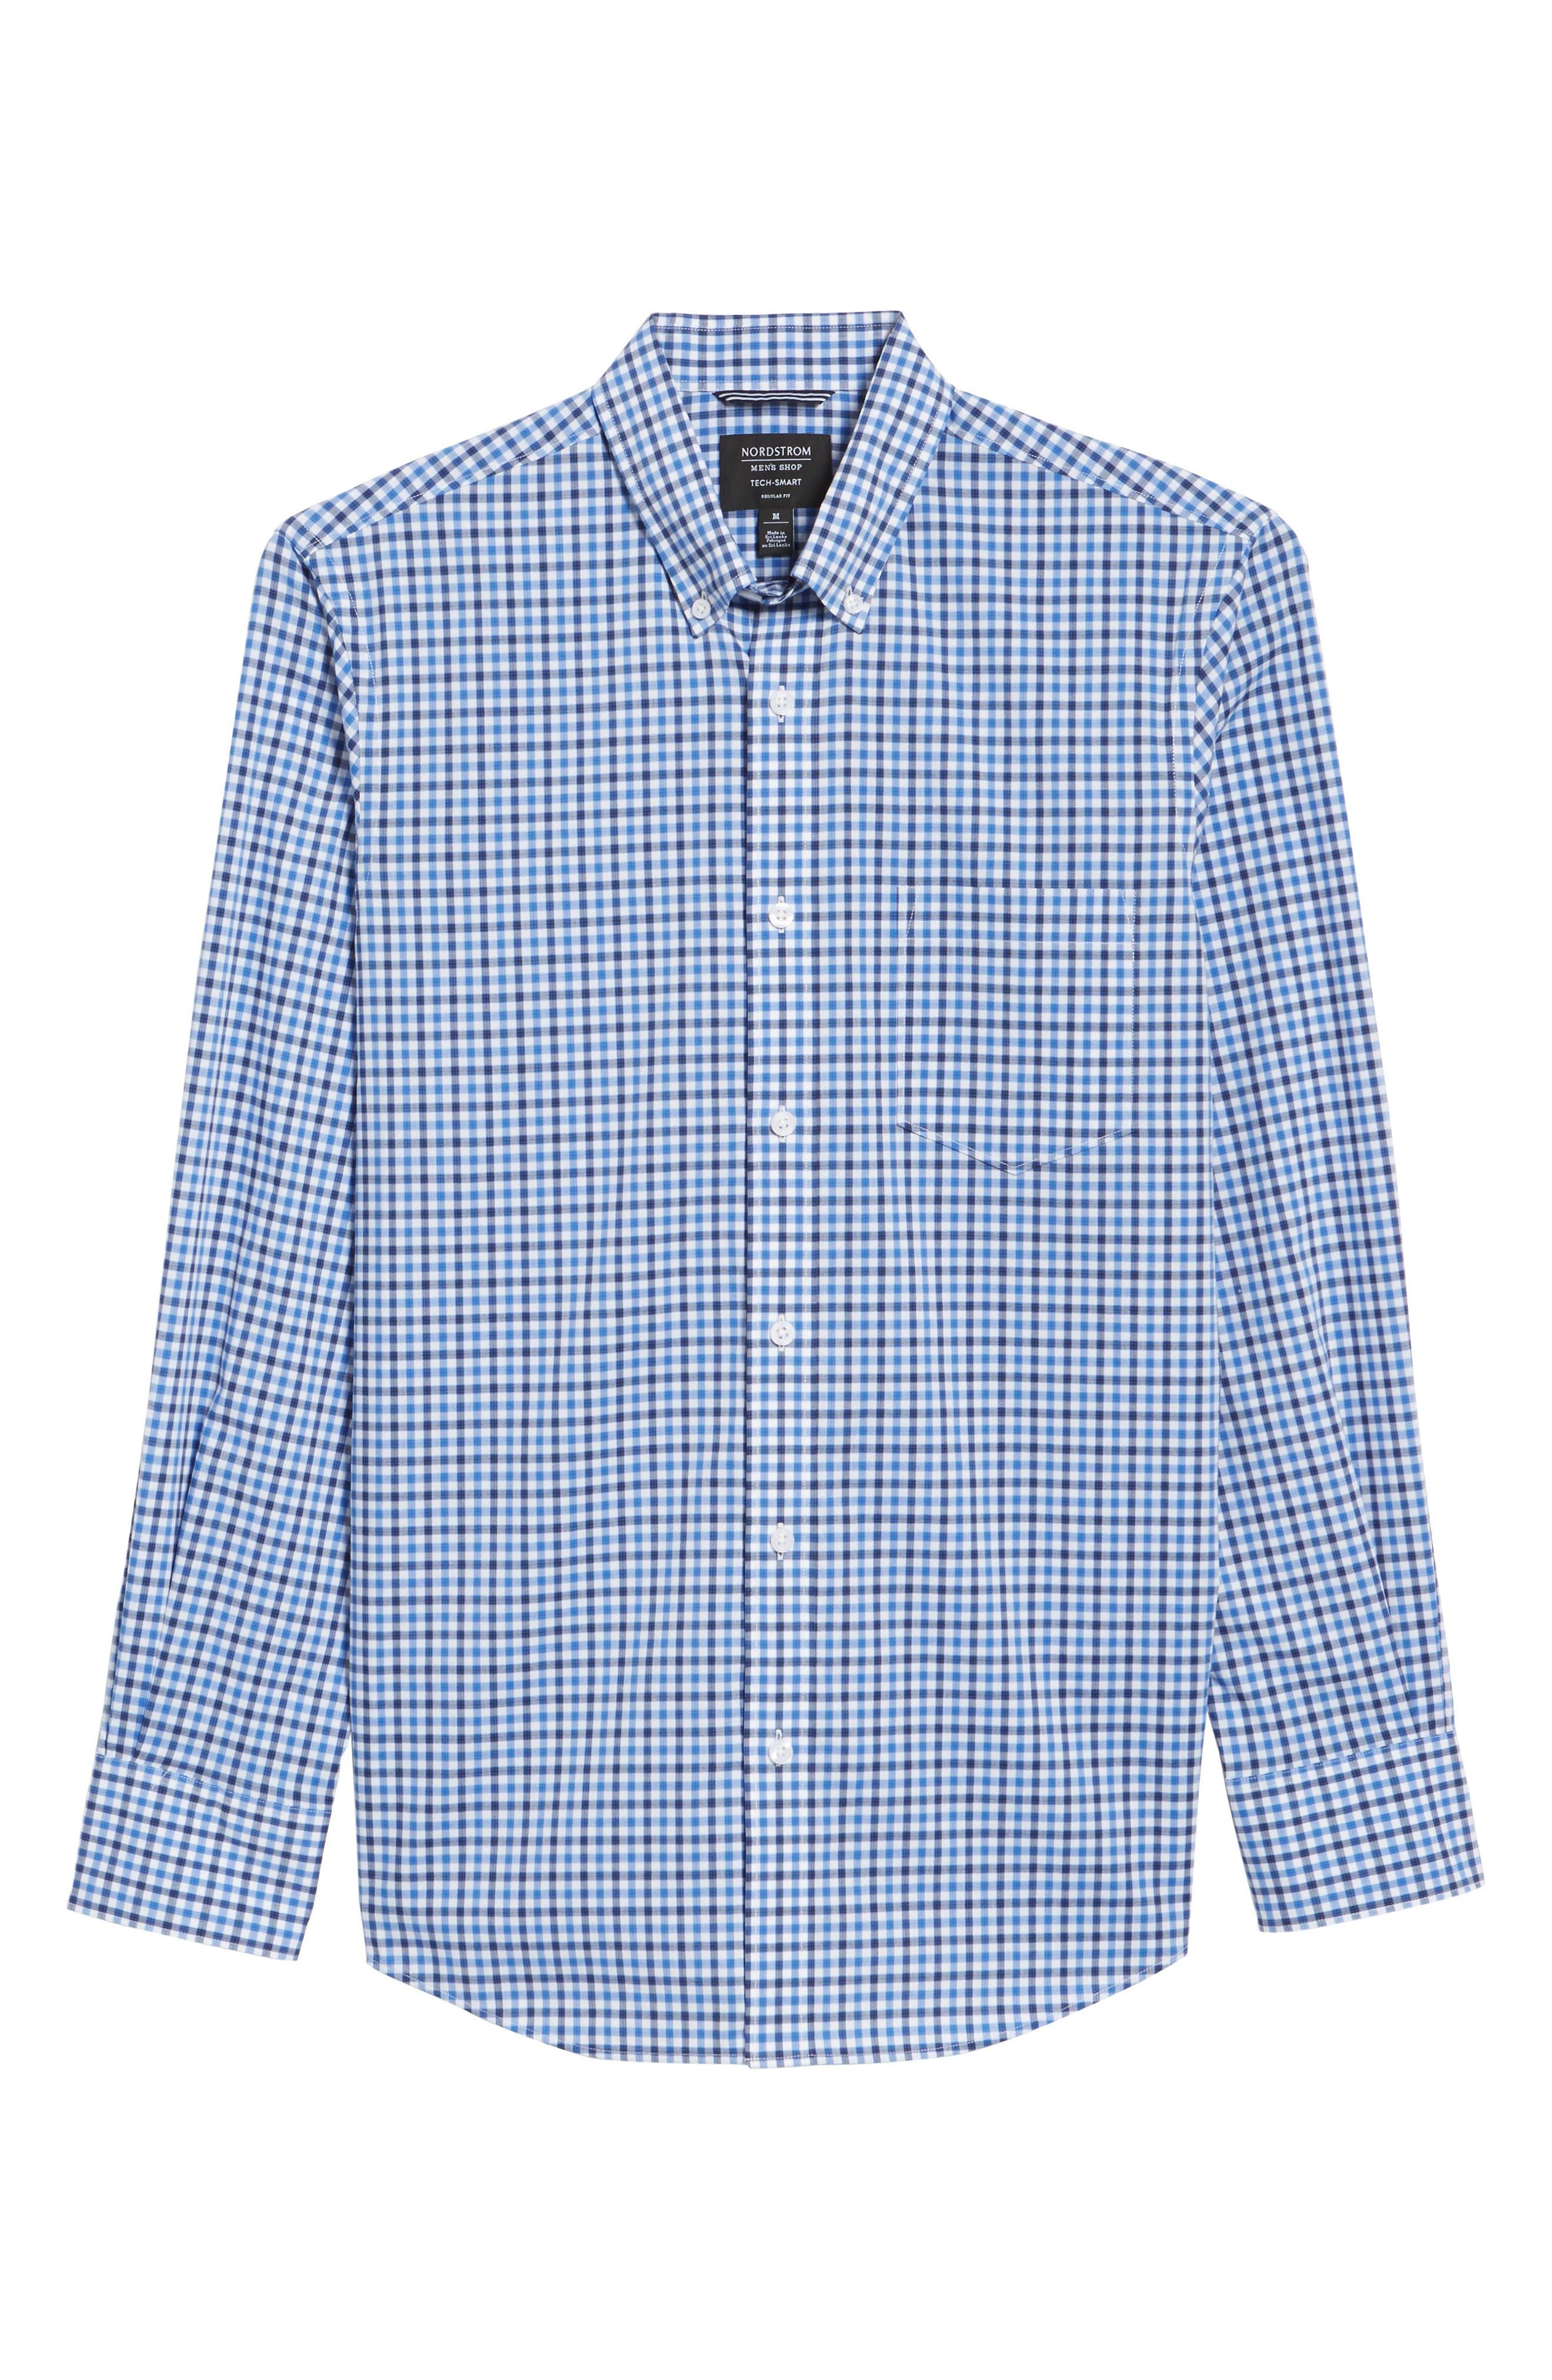 Tech-Smart Regular Fit Check Sport Shirt,                             Alternate thumbnail 6, color,                             420